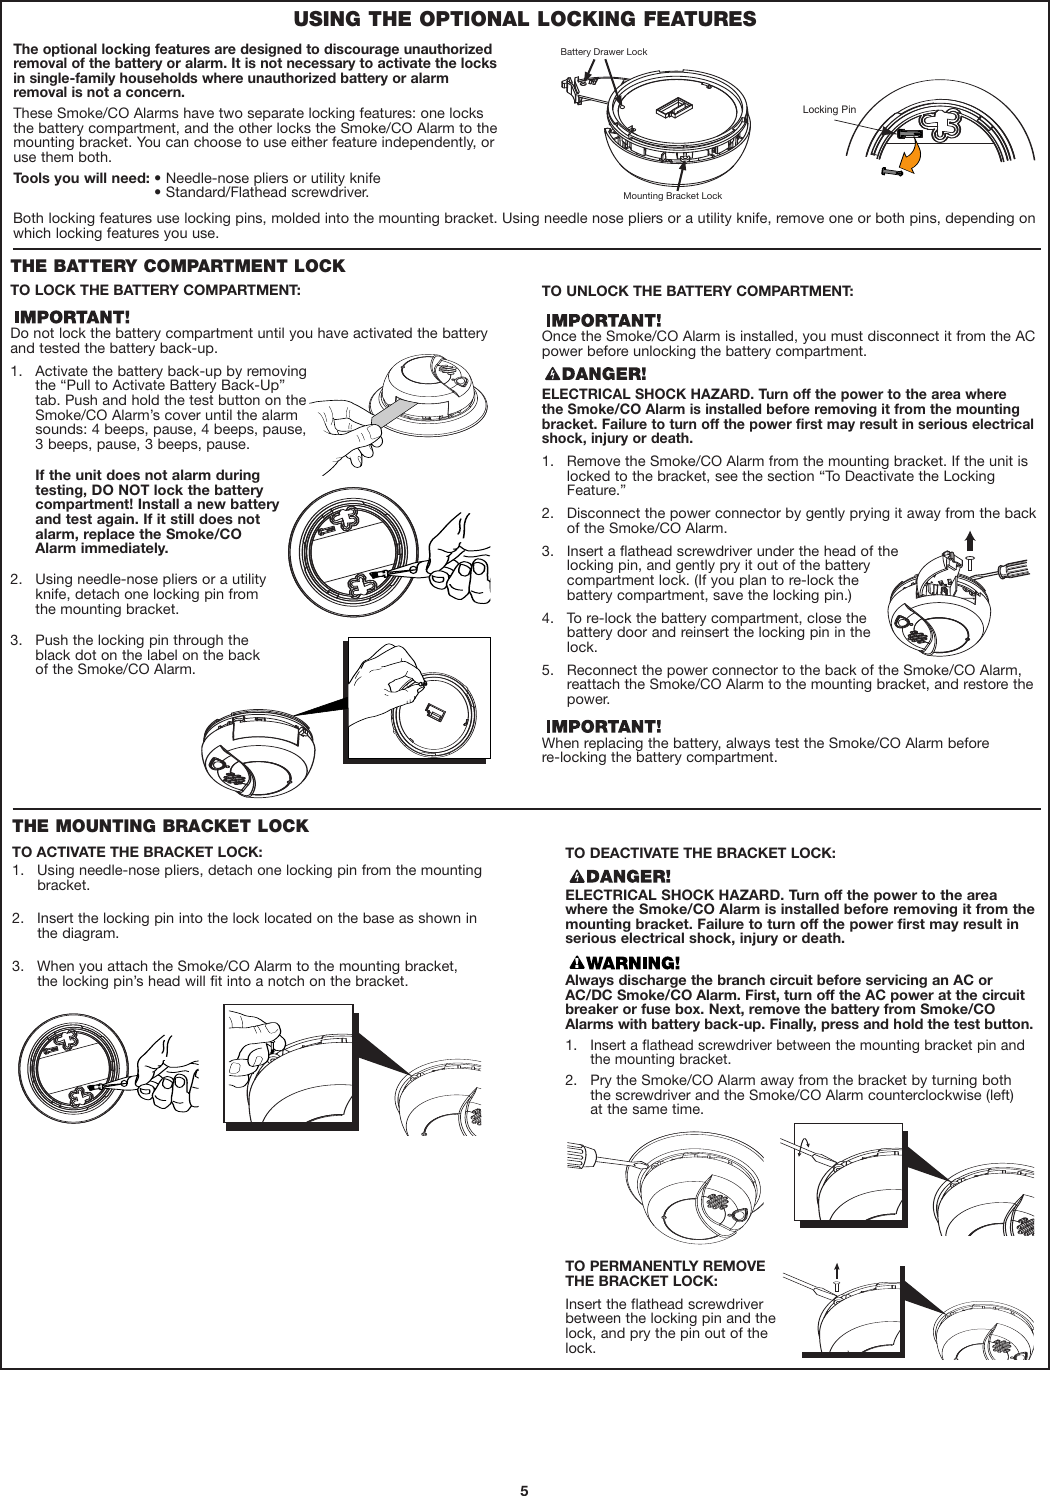 First Alert Carbon Monoxide Alarm Ul217 Users Manual Sc9120b Smoke Wiring Diagram Page 5 Of 11